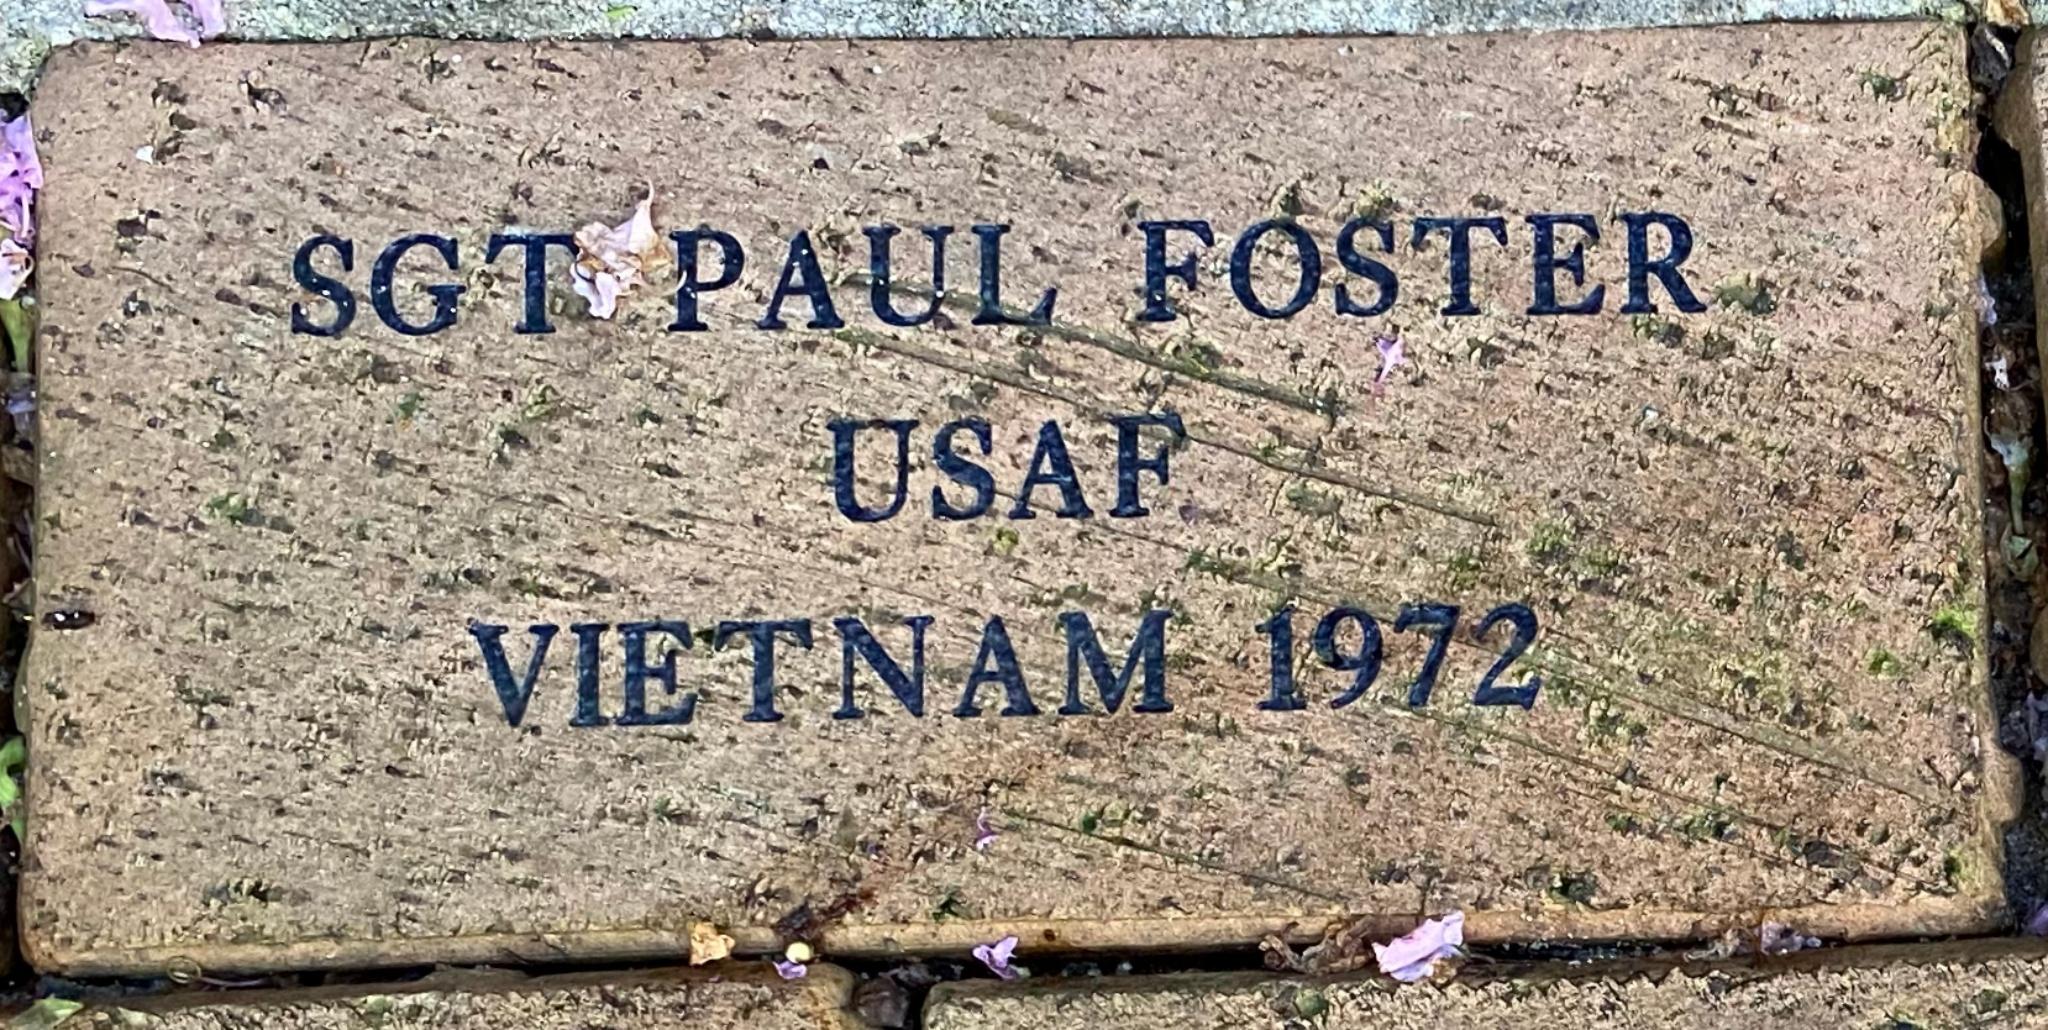 SGT PAUL FOSTER USAF VIETNAM 1972